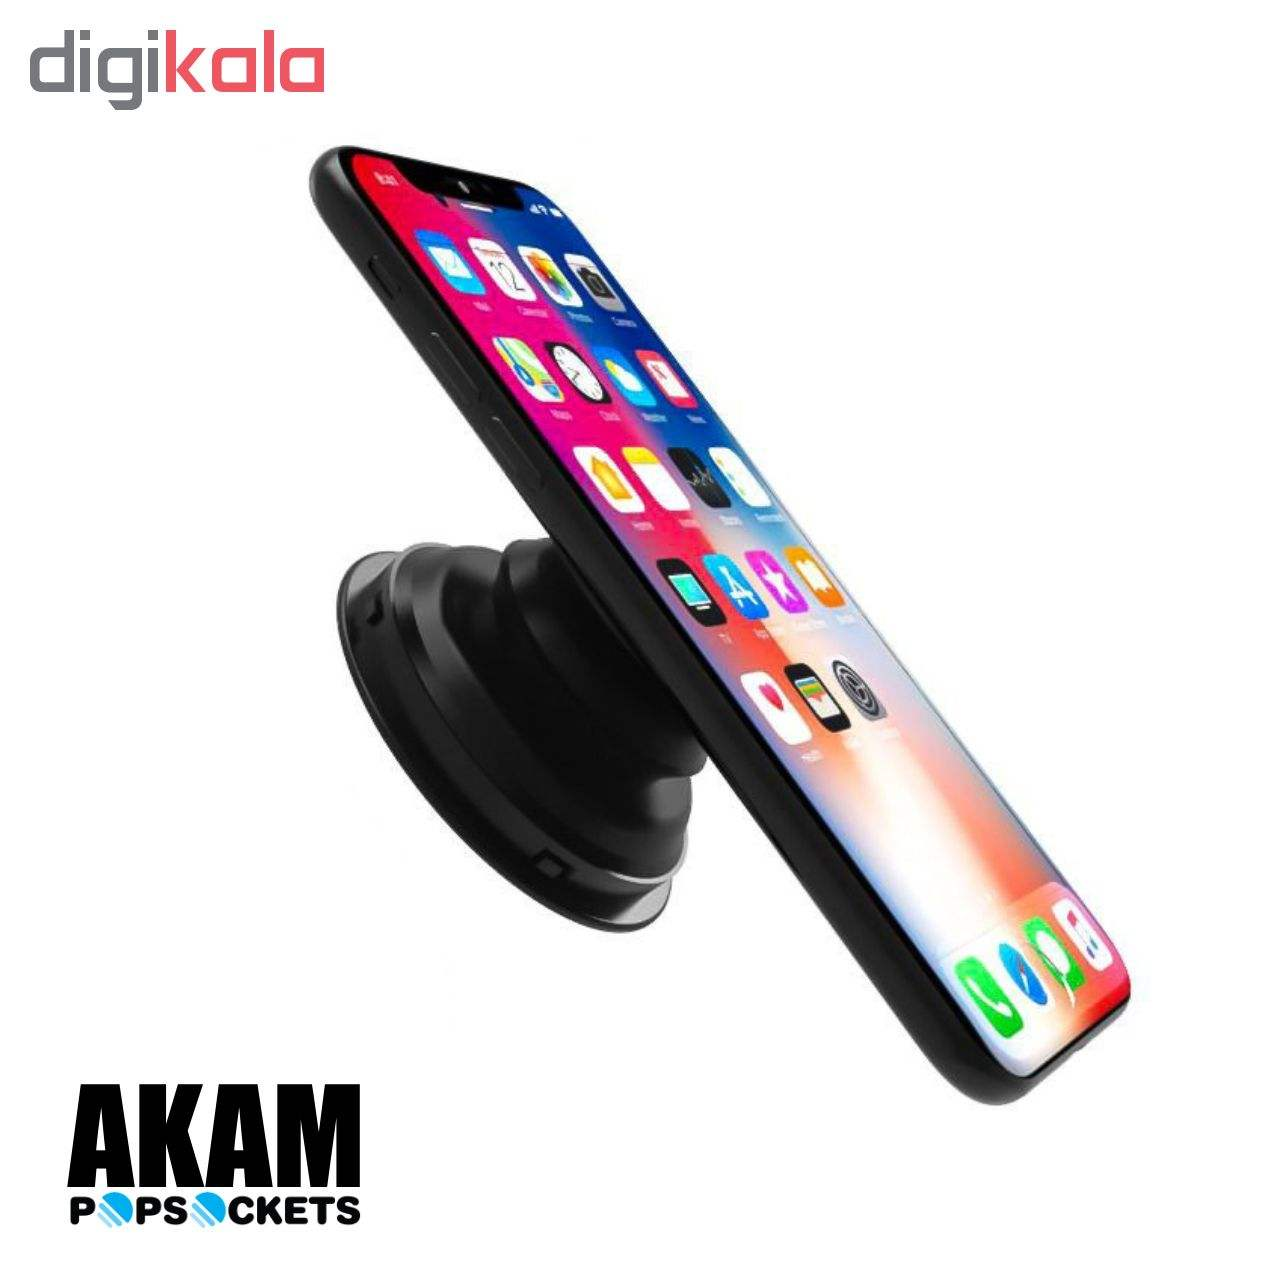 پایه نگهدارنده گوشی موبایل پاپ سوکت آکام مدل APS0057 main 1 7